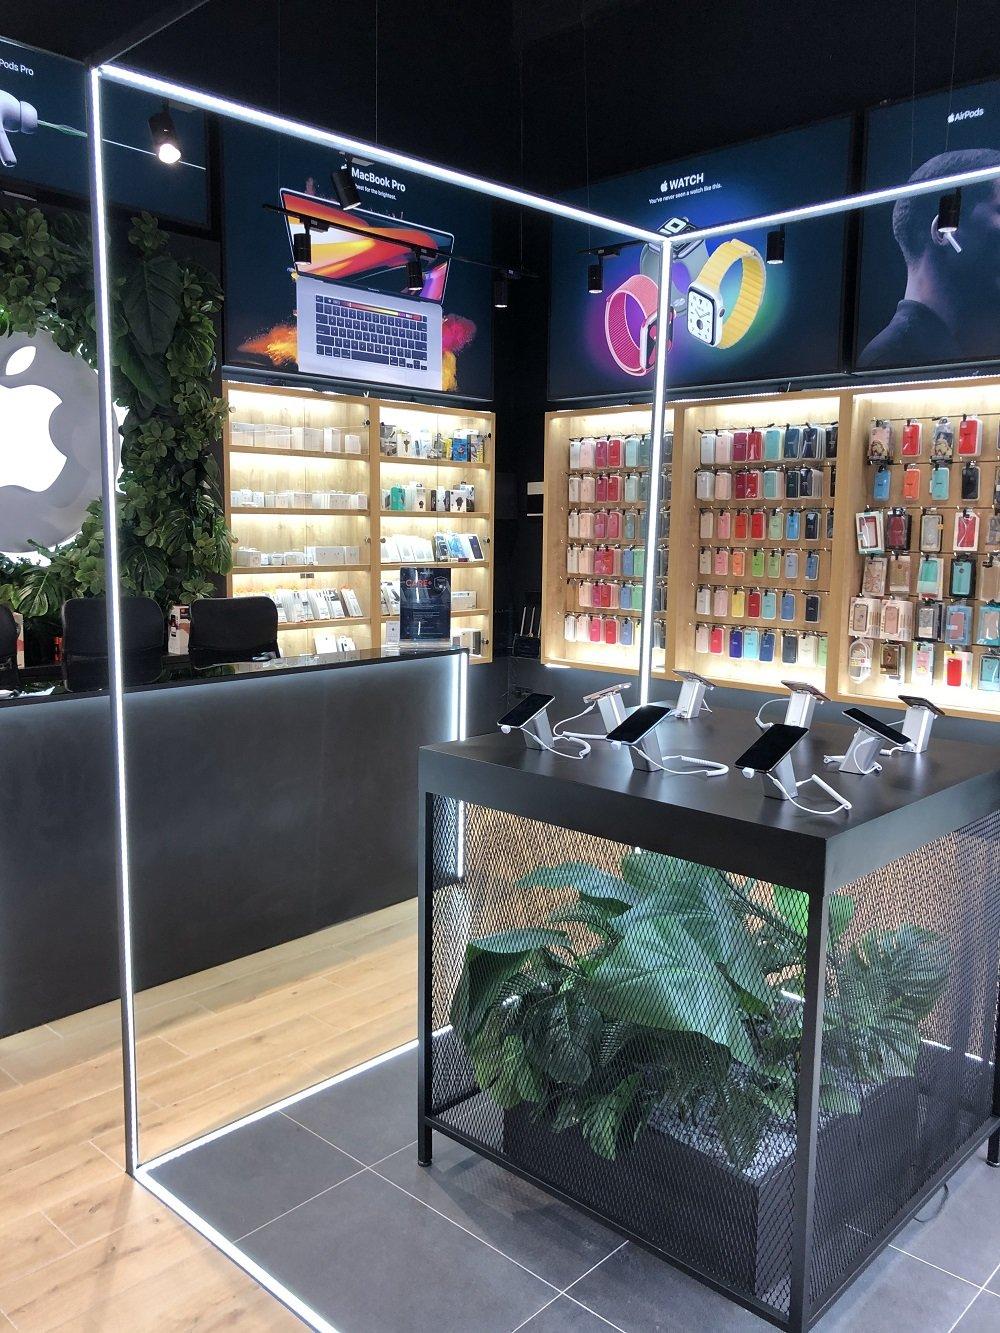 iPhone SE 2020 – найдешевший смартфон Apple вже в Apple Room, фото-8